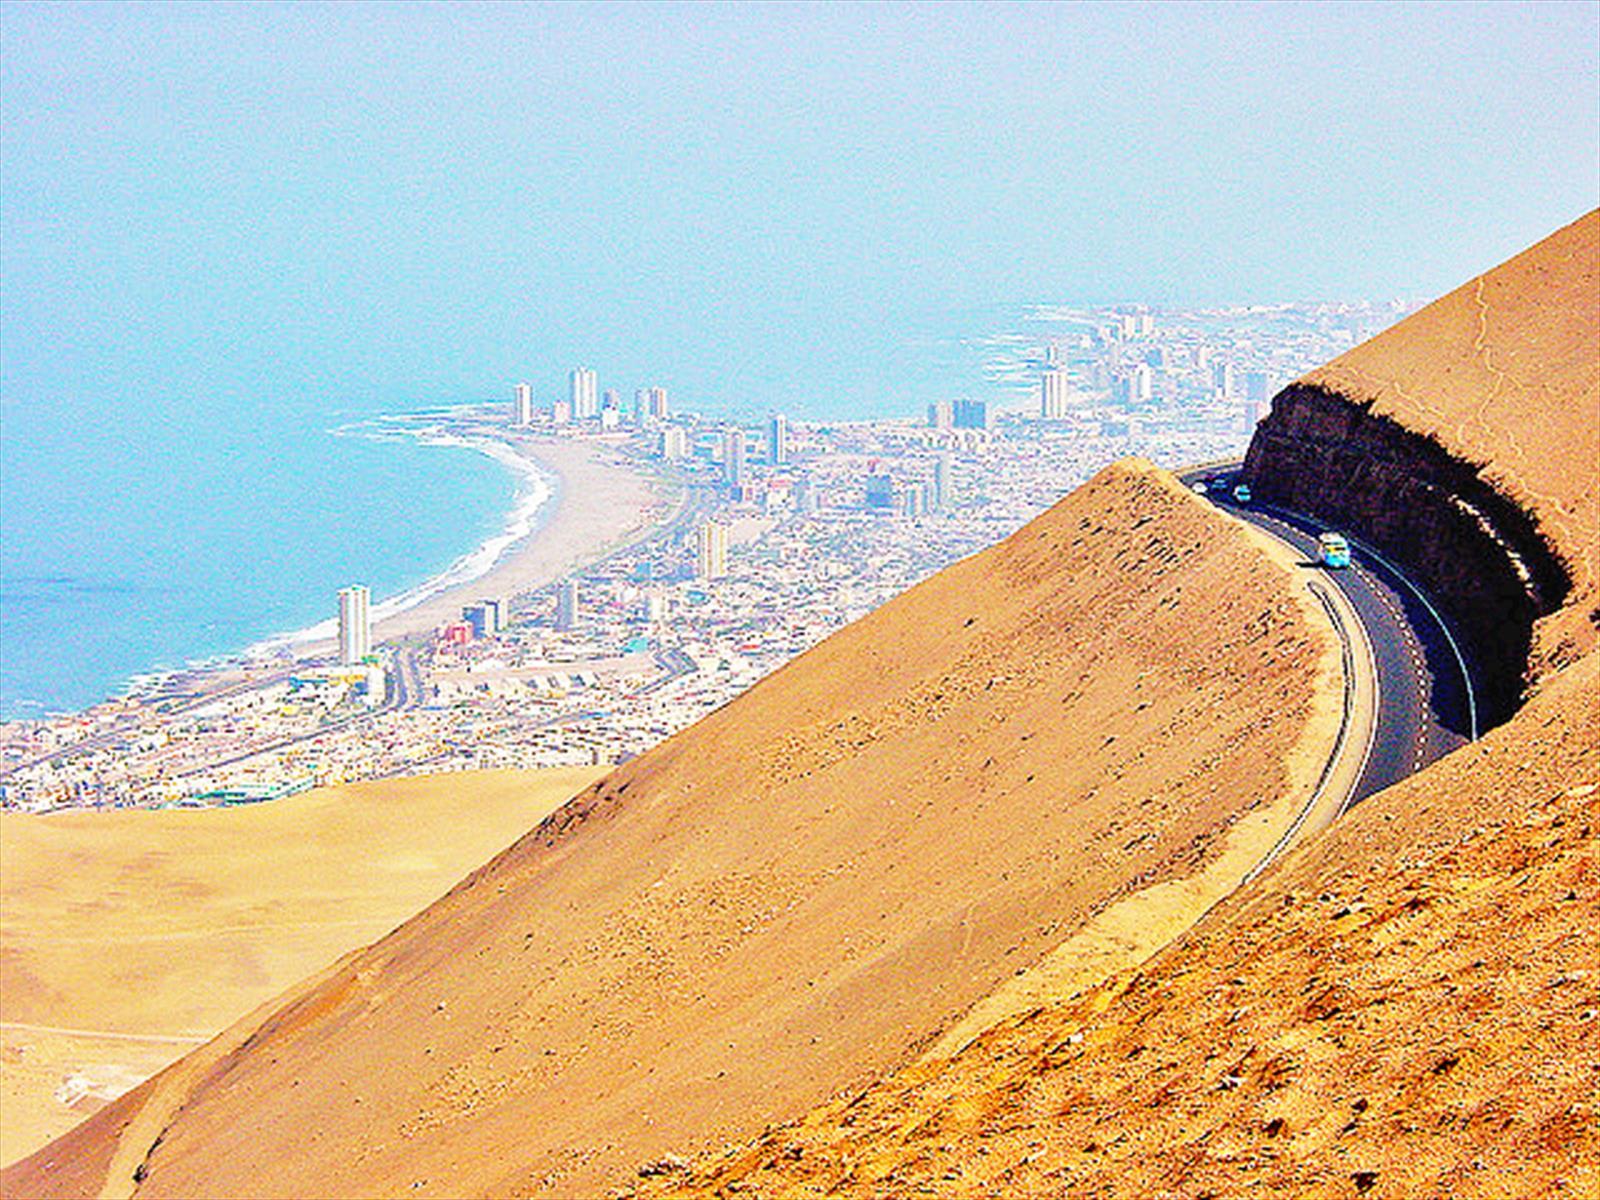 Top 10 Las Carreteras Mas Peligrosas Del Planeta